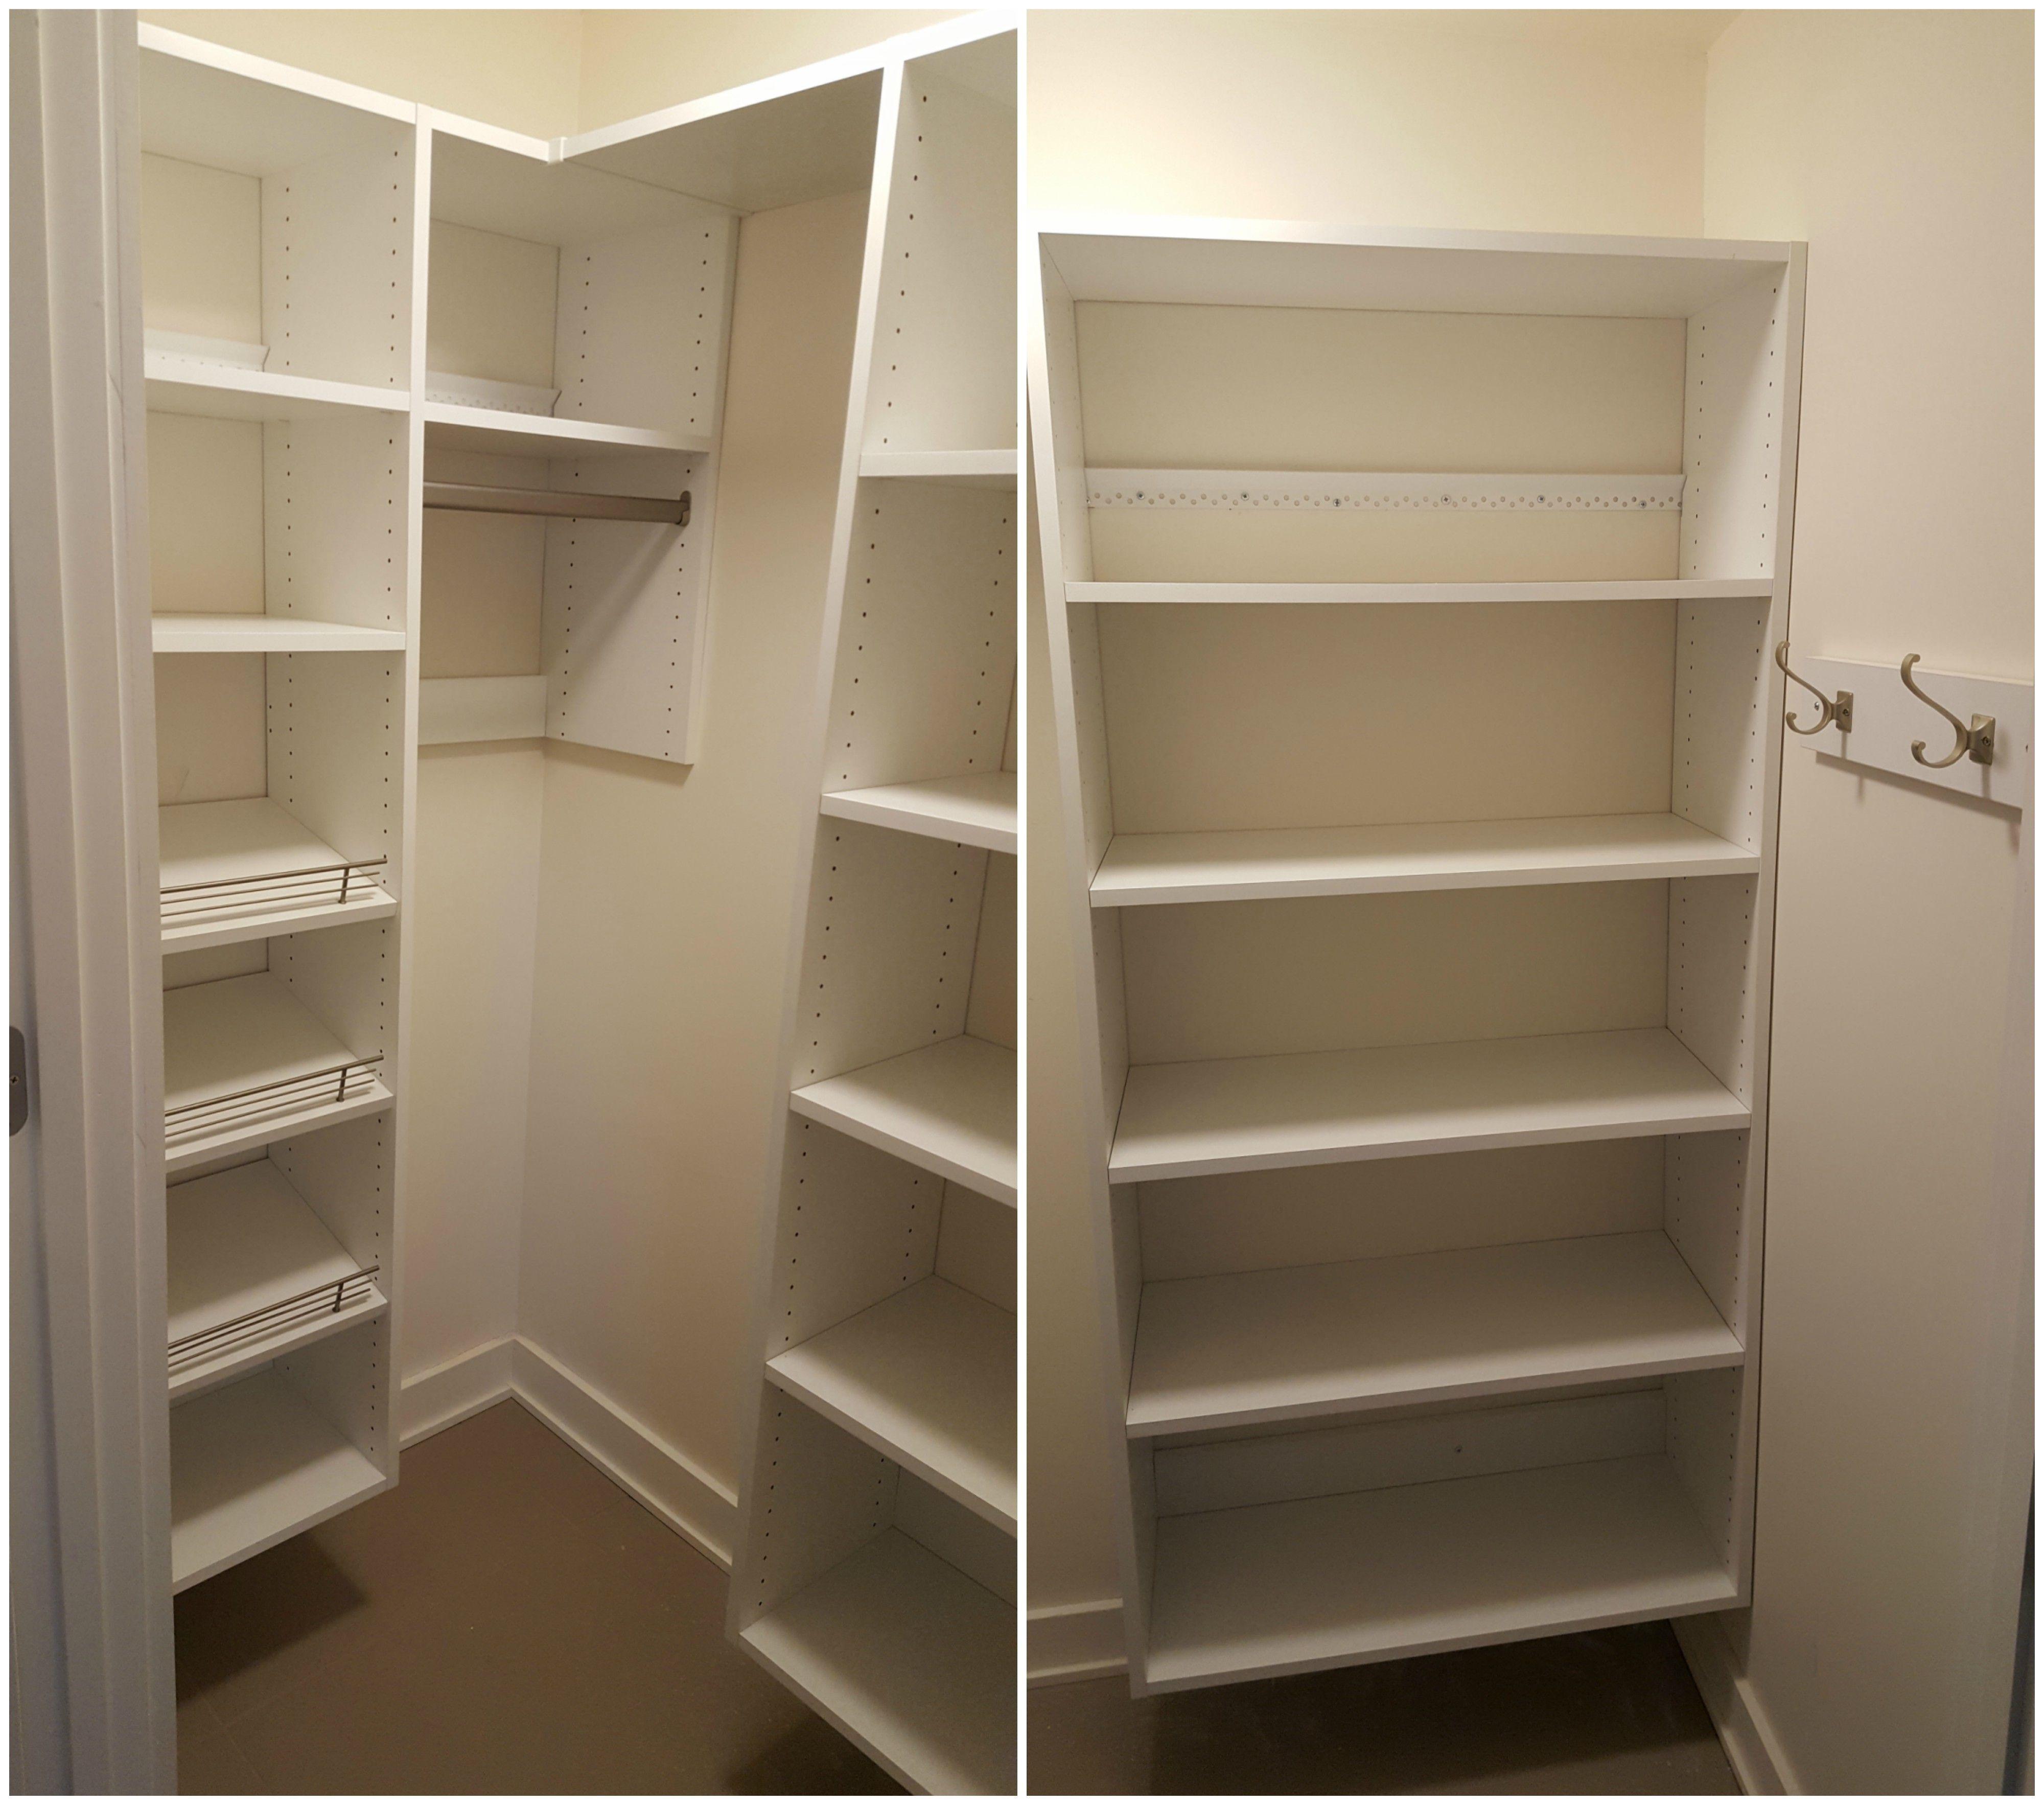 White Melamine Coat Closet With Adjule Shelving Long Hang Shoe Fences And Wall Hooks